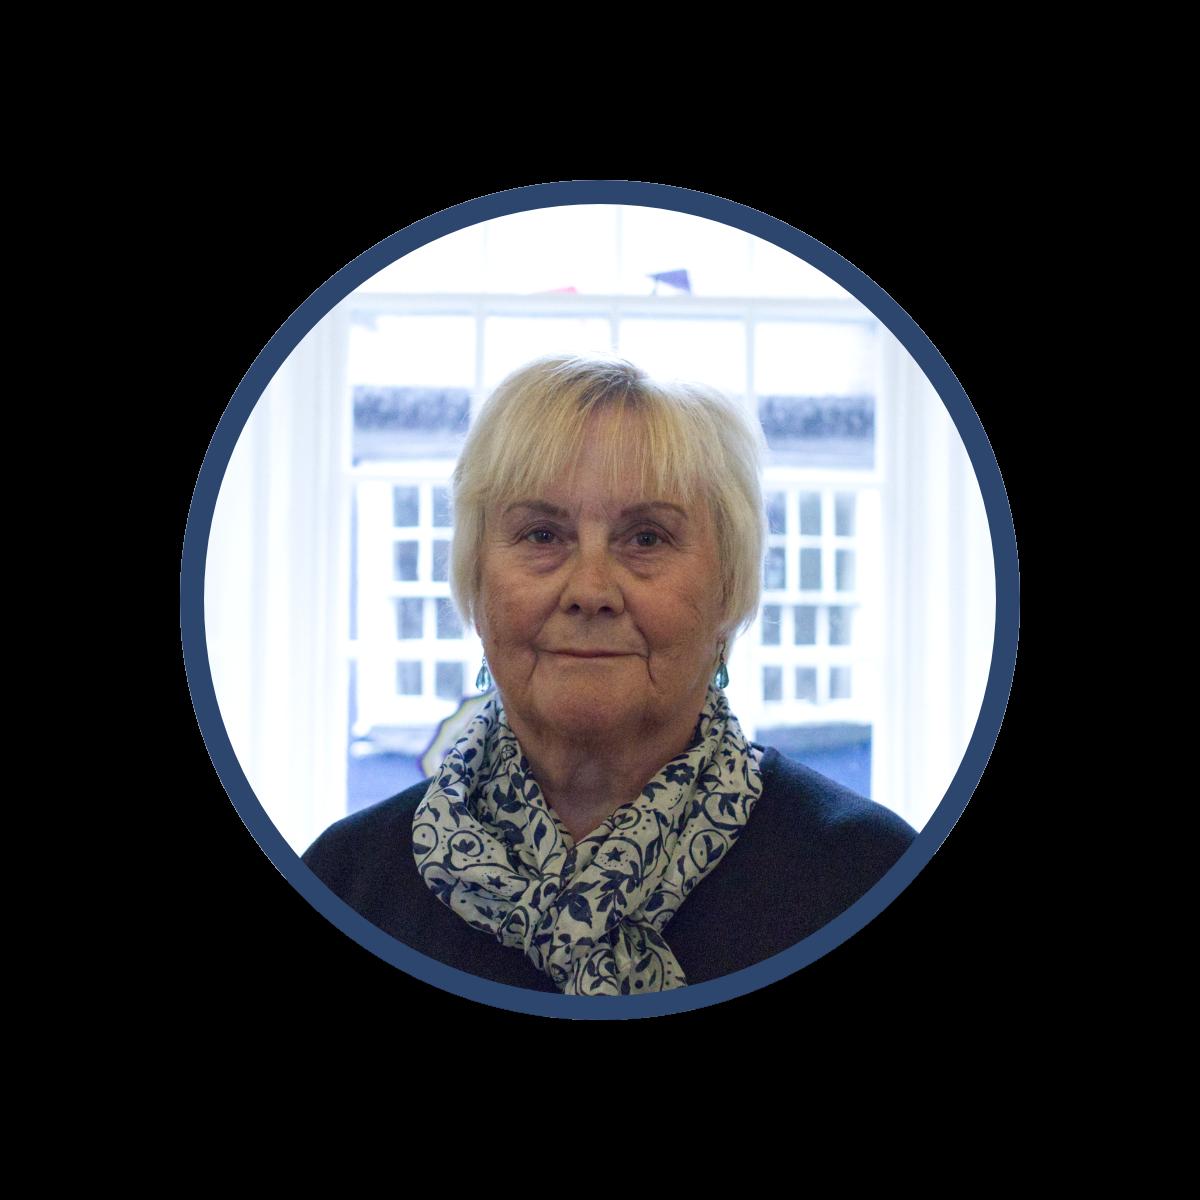 Portrait photo of Councillor Gillian Ann Grant